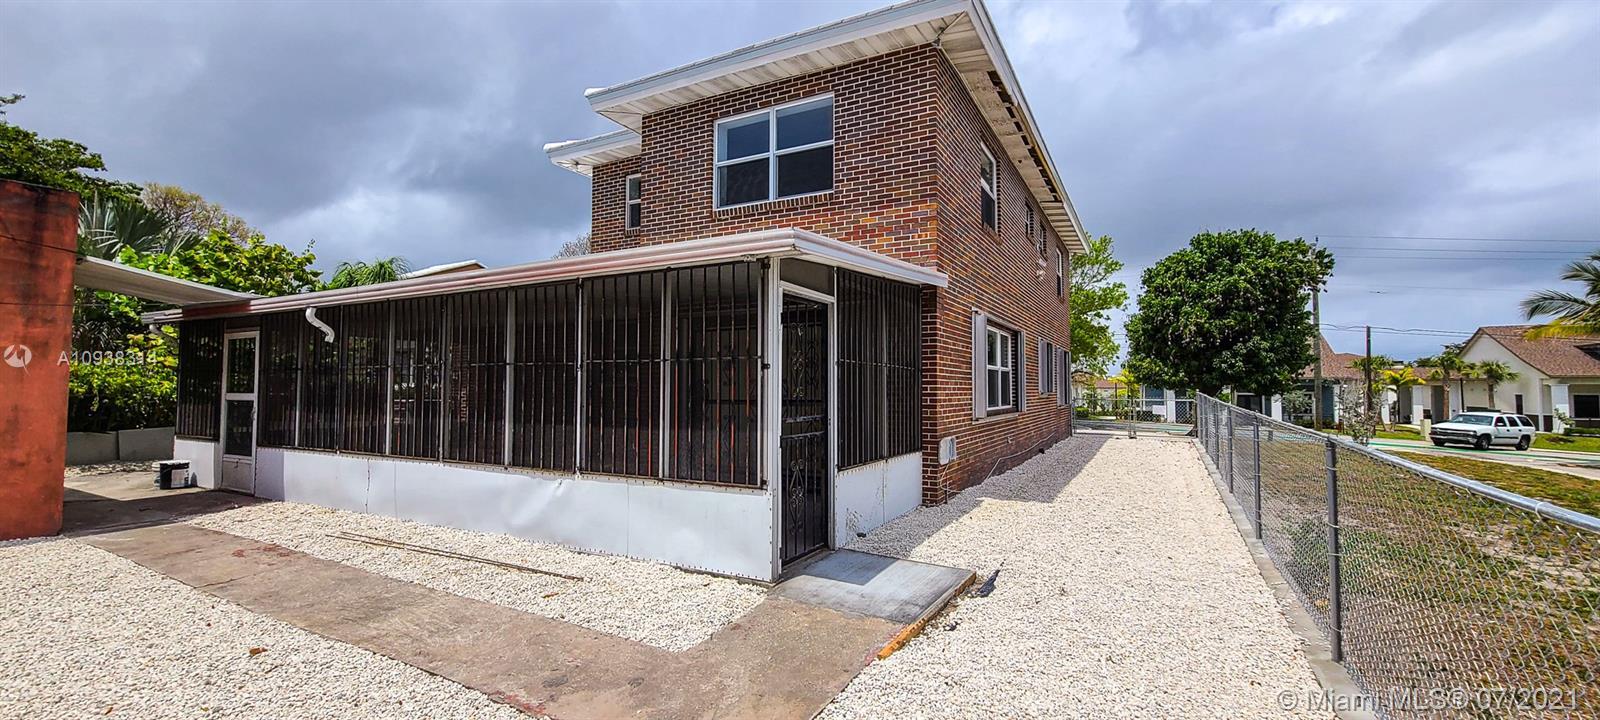 /  2656 sq. ft. $ 2020-10-06 0 Photo